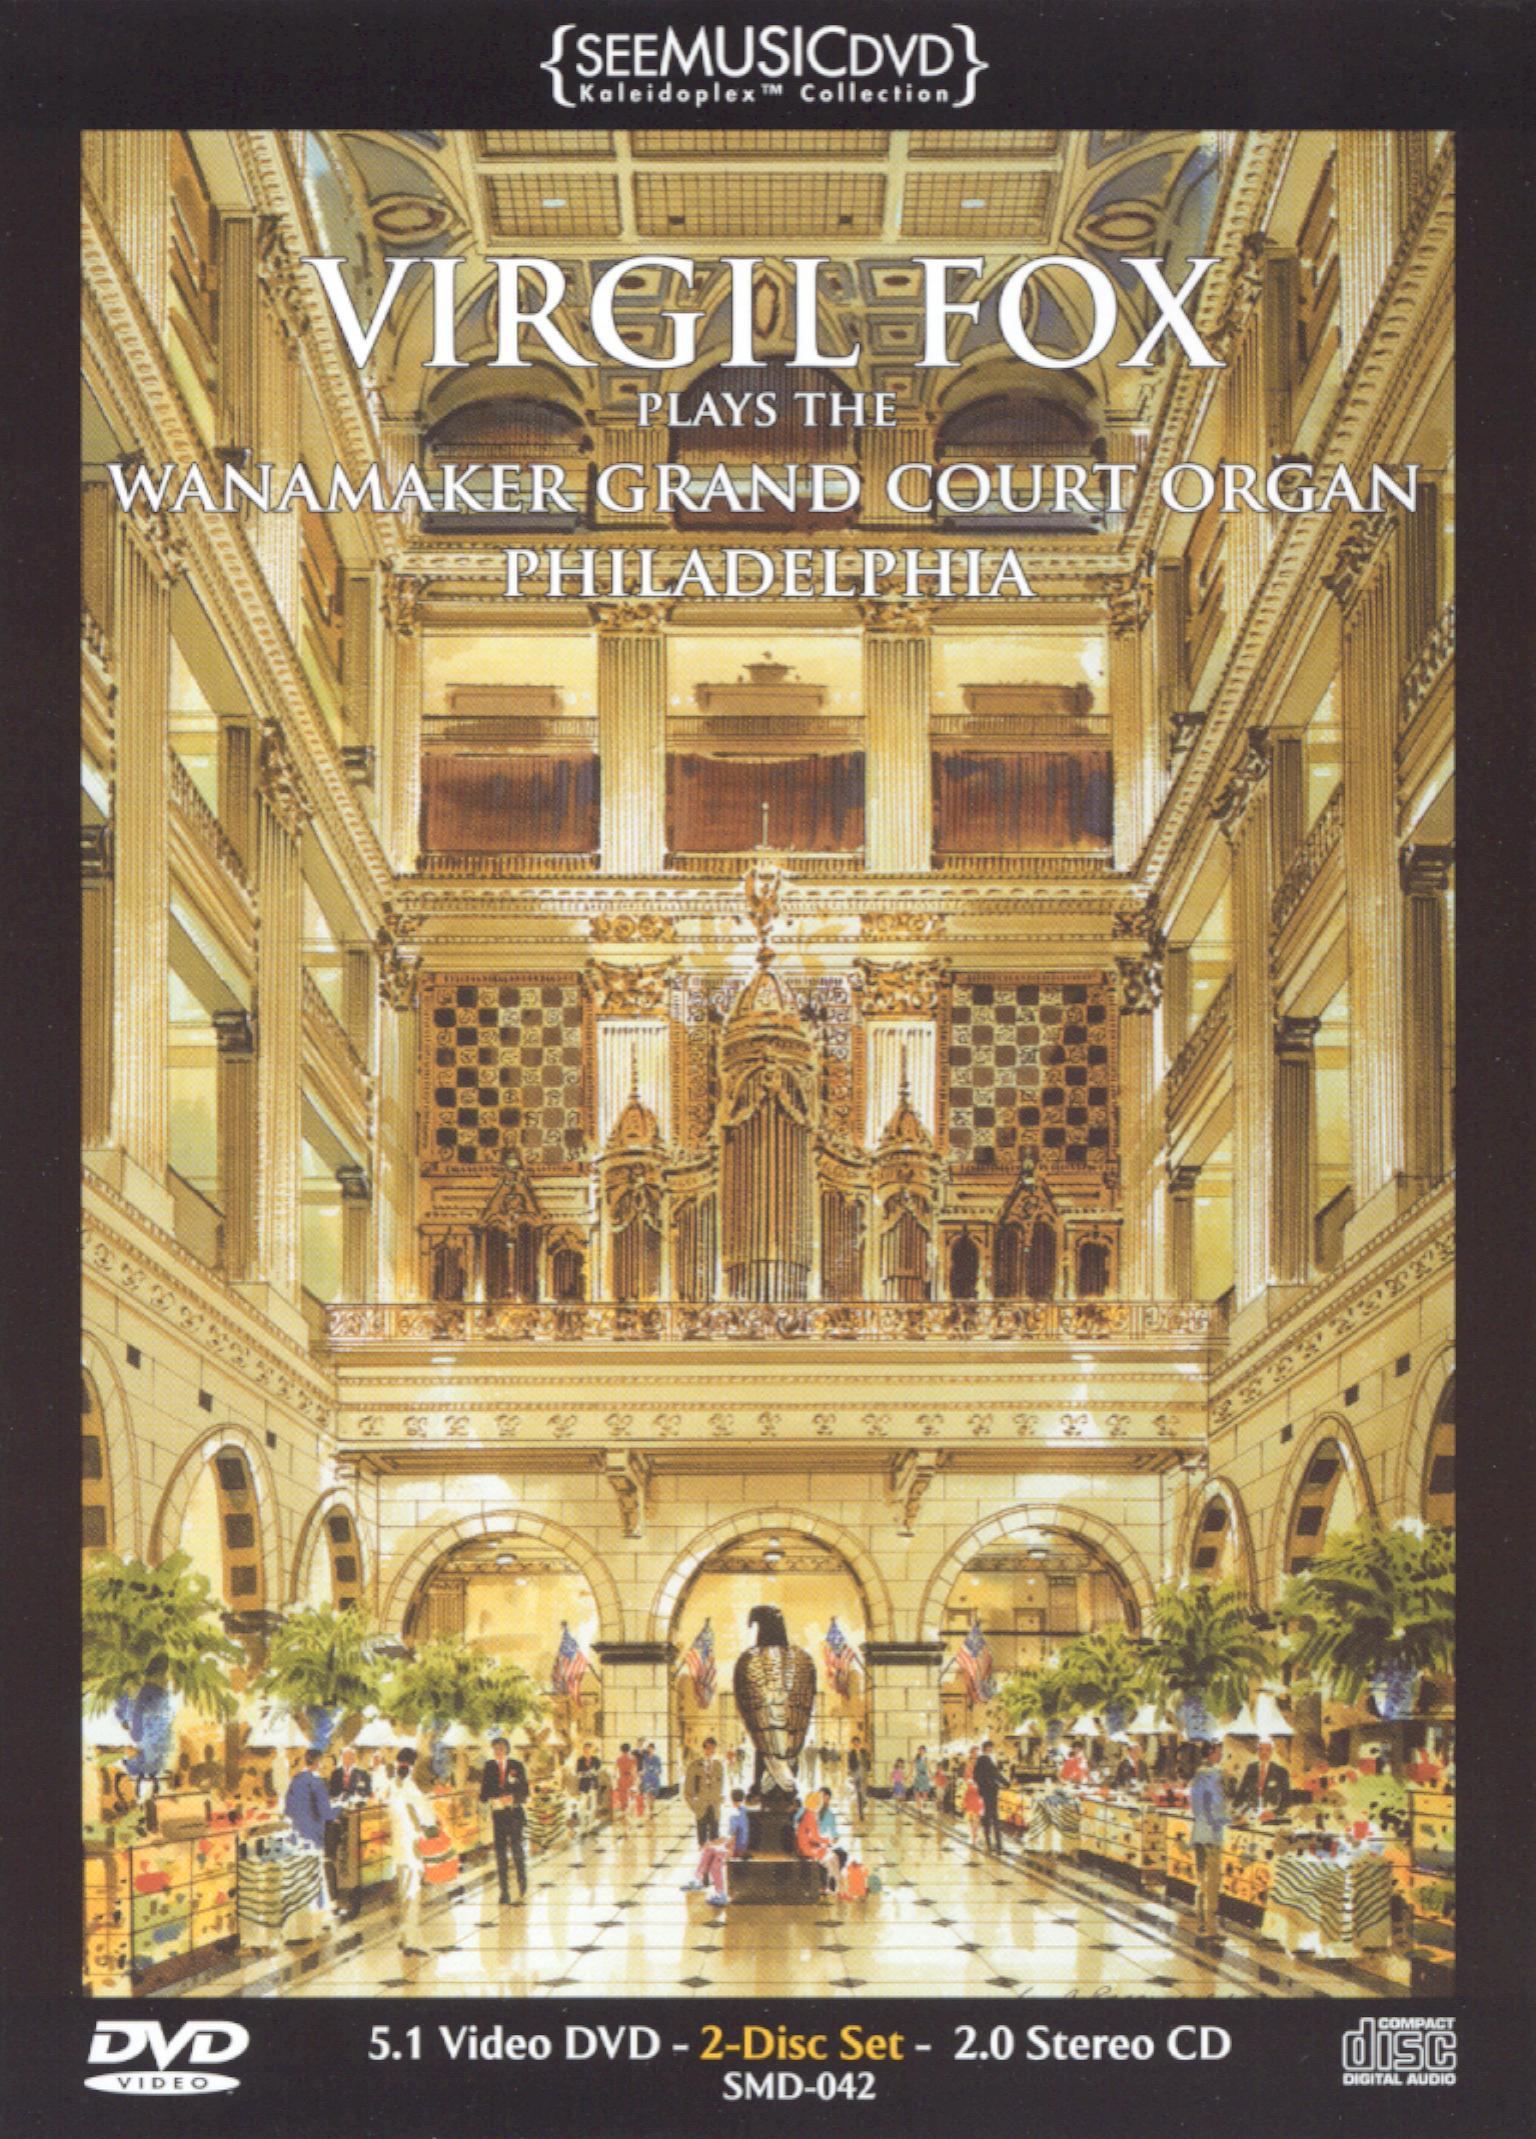 Virgil Fox Plays the Wanamaker Grand Court Organ